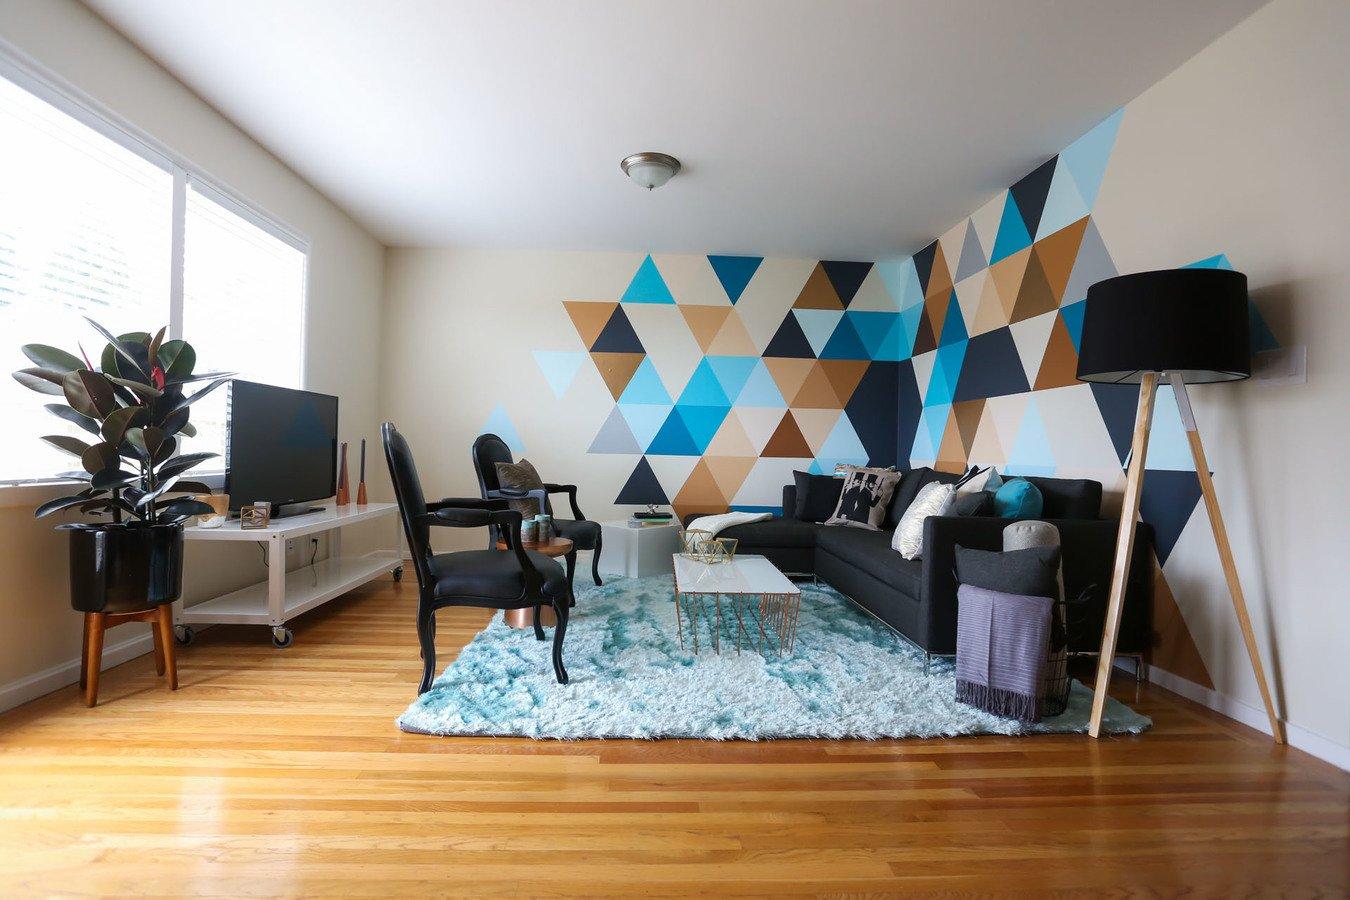 1 Bedroom 1 Bathroom Apartment for rent at 240 Cumberland Apartments & Suites in San Francisco, CA